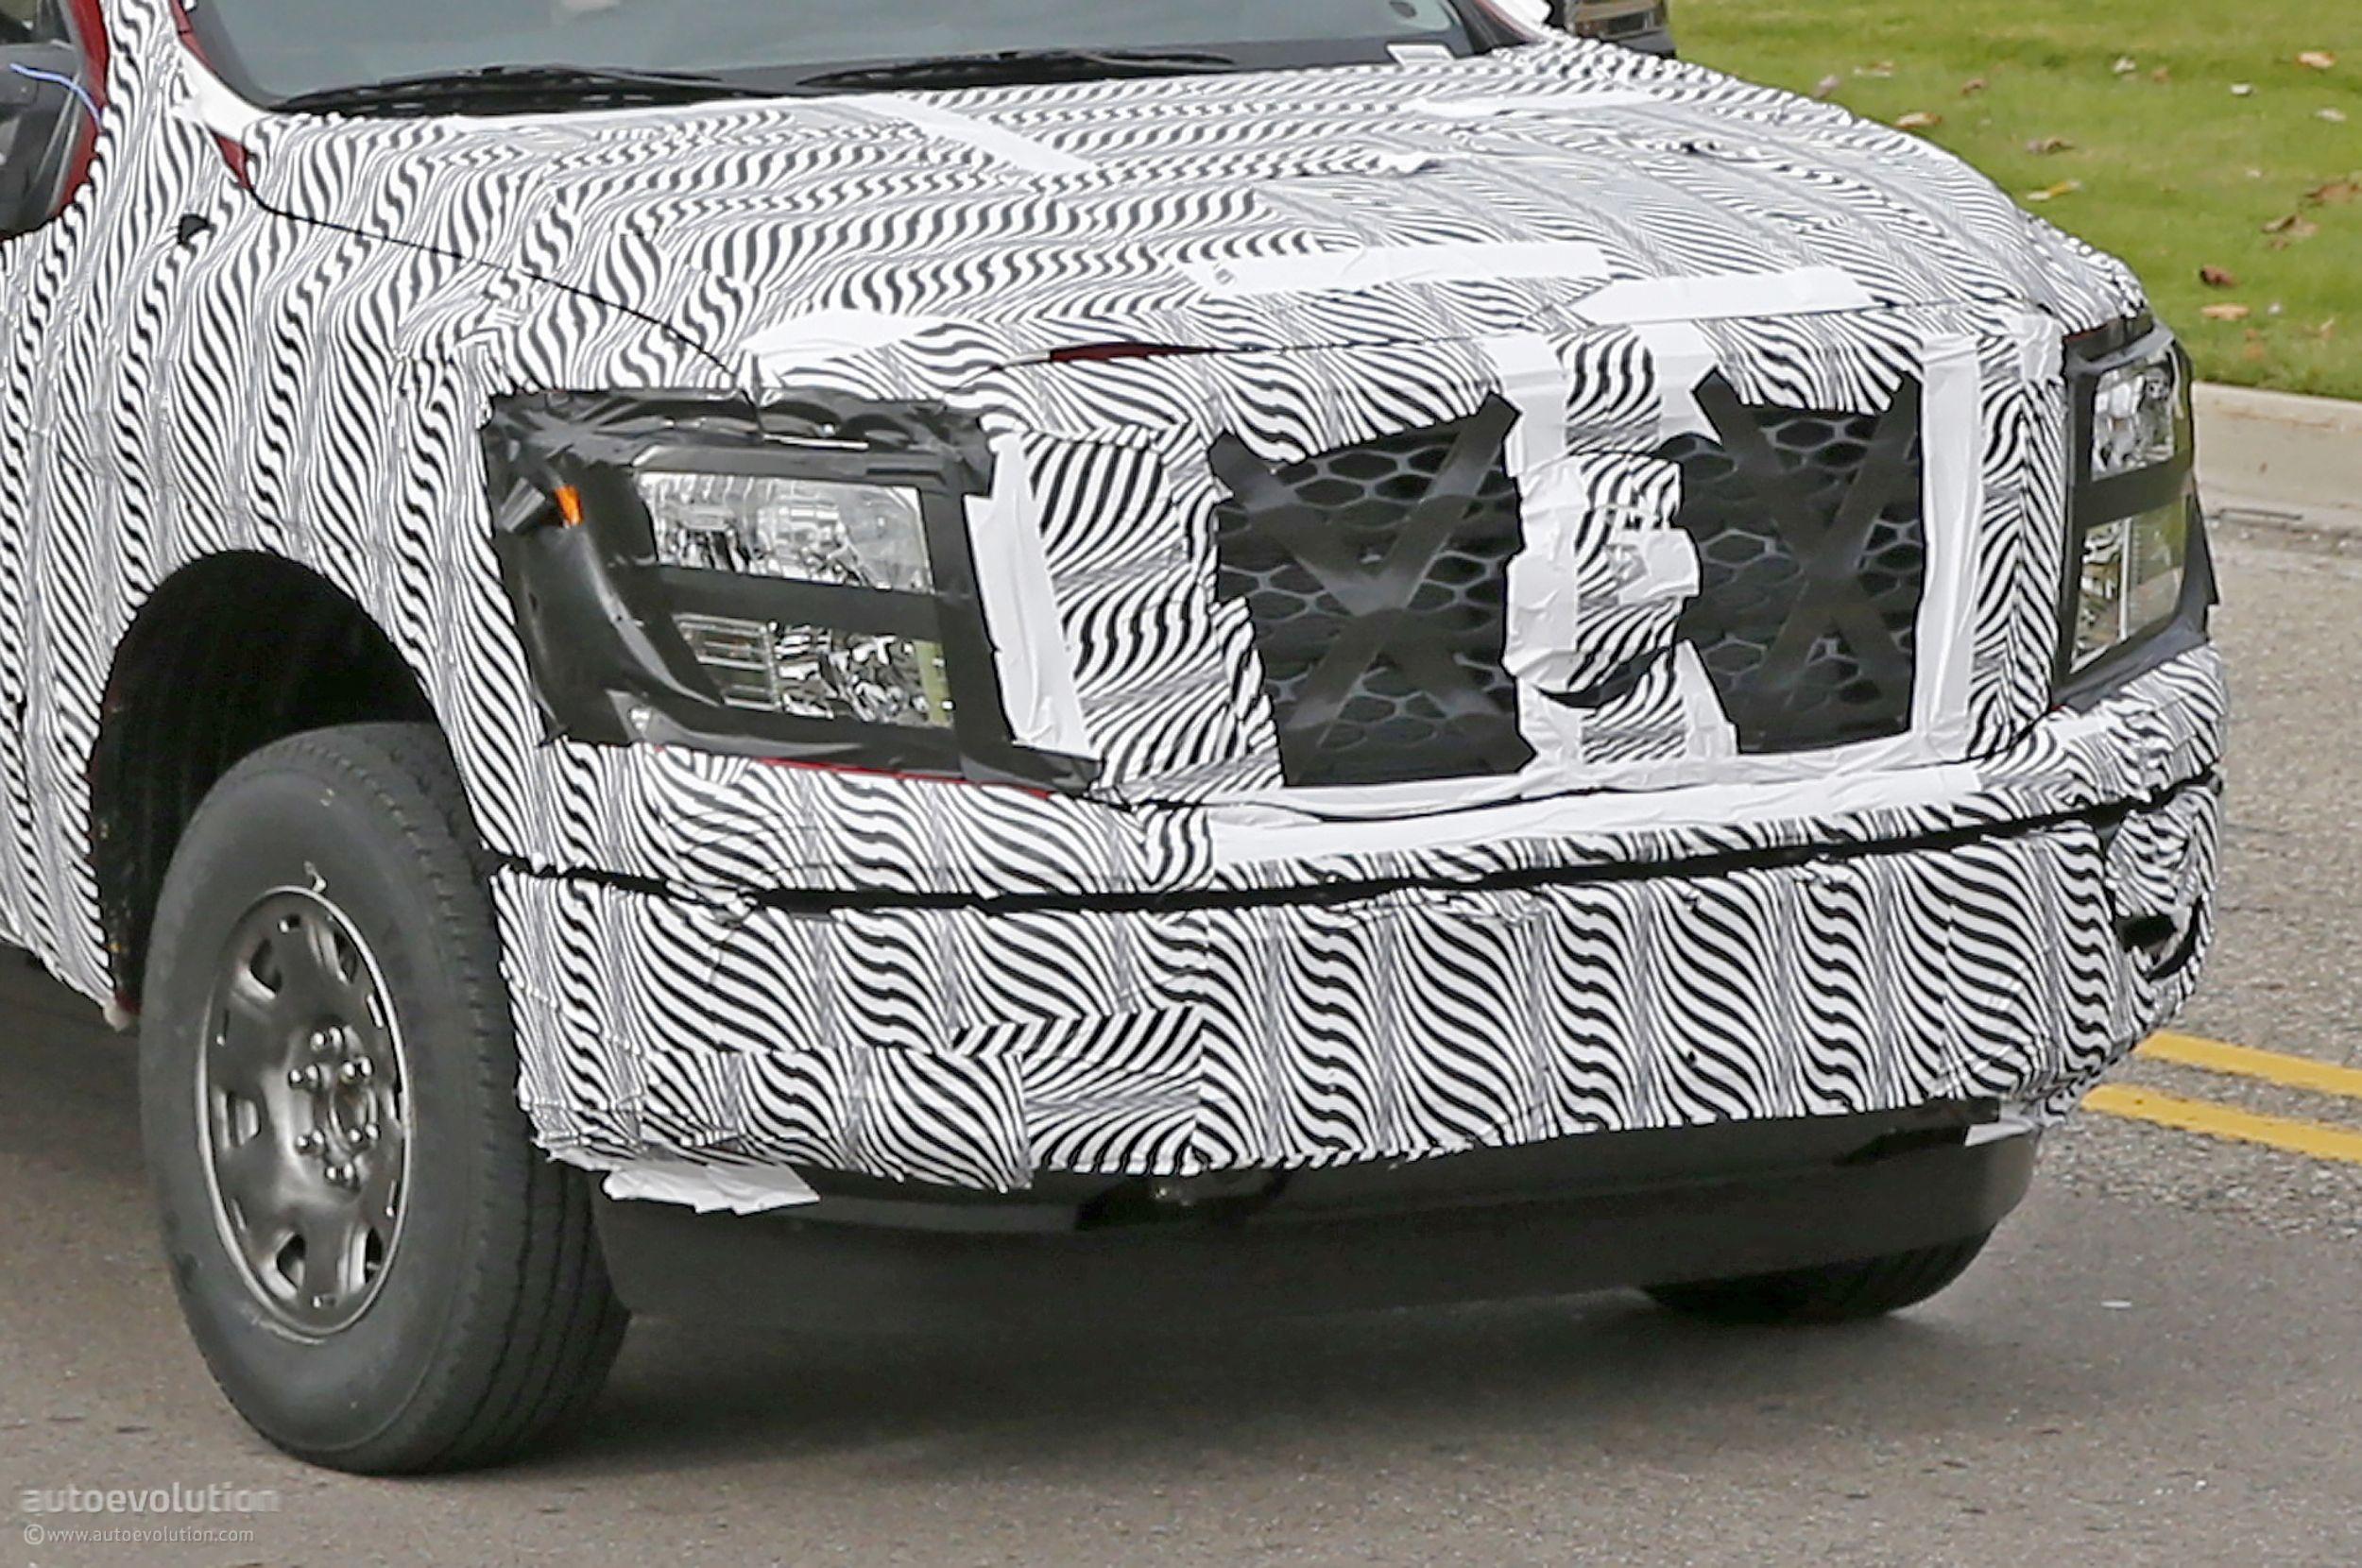 2016 nissan titan isv cummins turbo diesel test mule